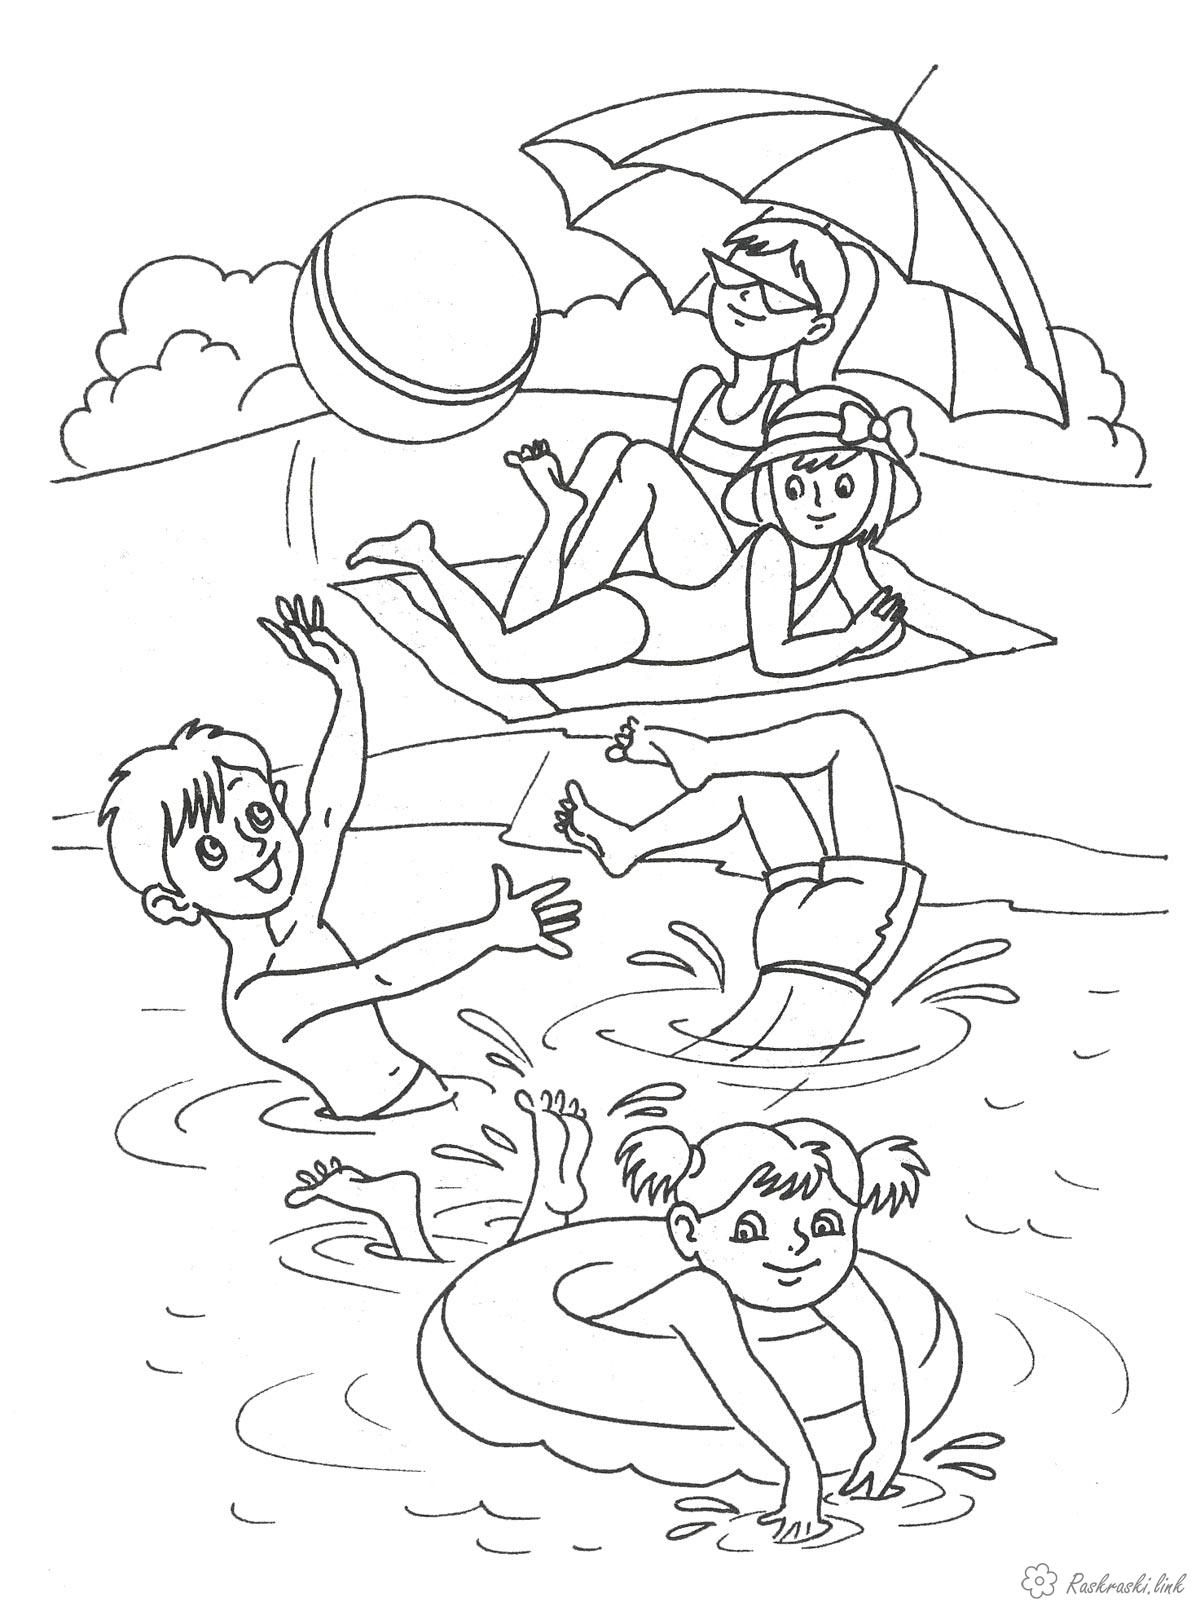 Розмальовки Пори року Розмальовки про літо, літні краскраскі